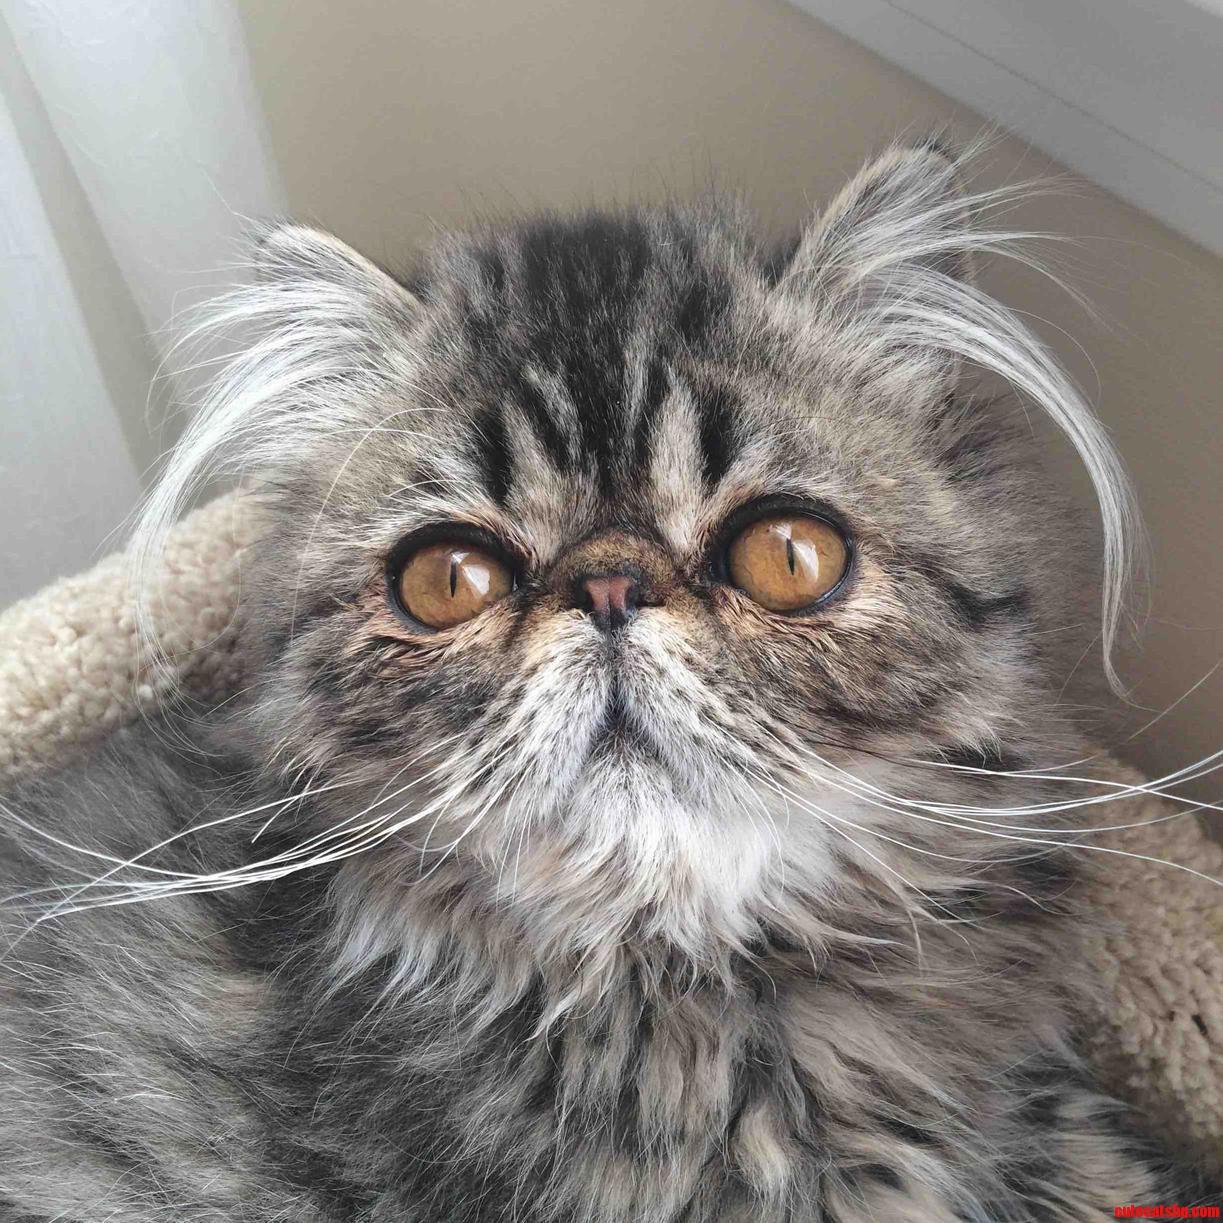 This is my kitten schnicklefritz